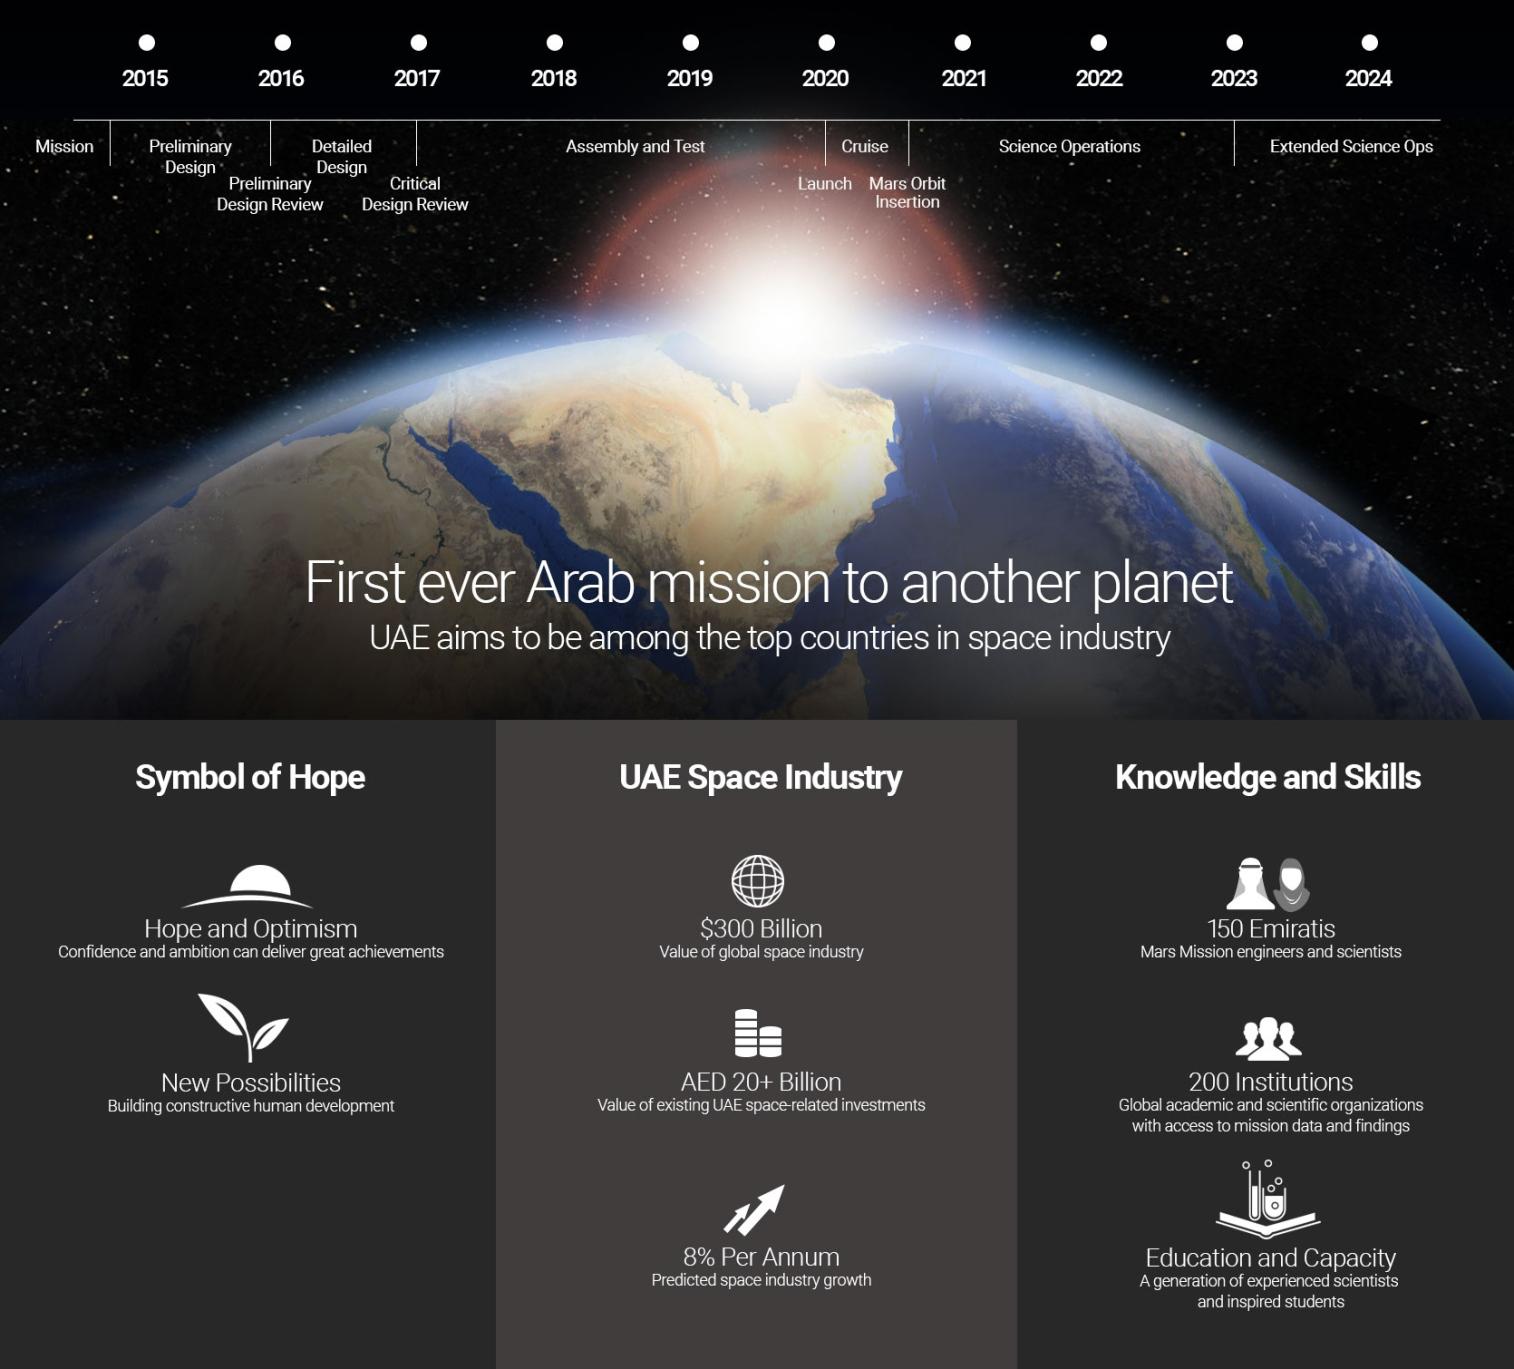 Mars Missions Help Nations Build Scientific Capabilities